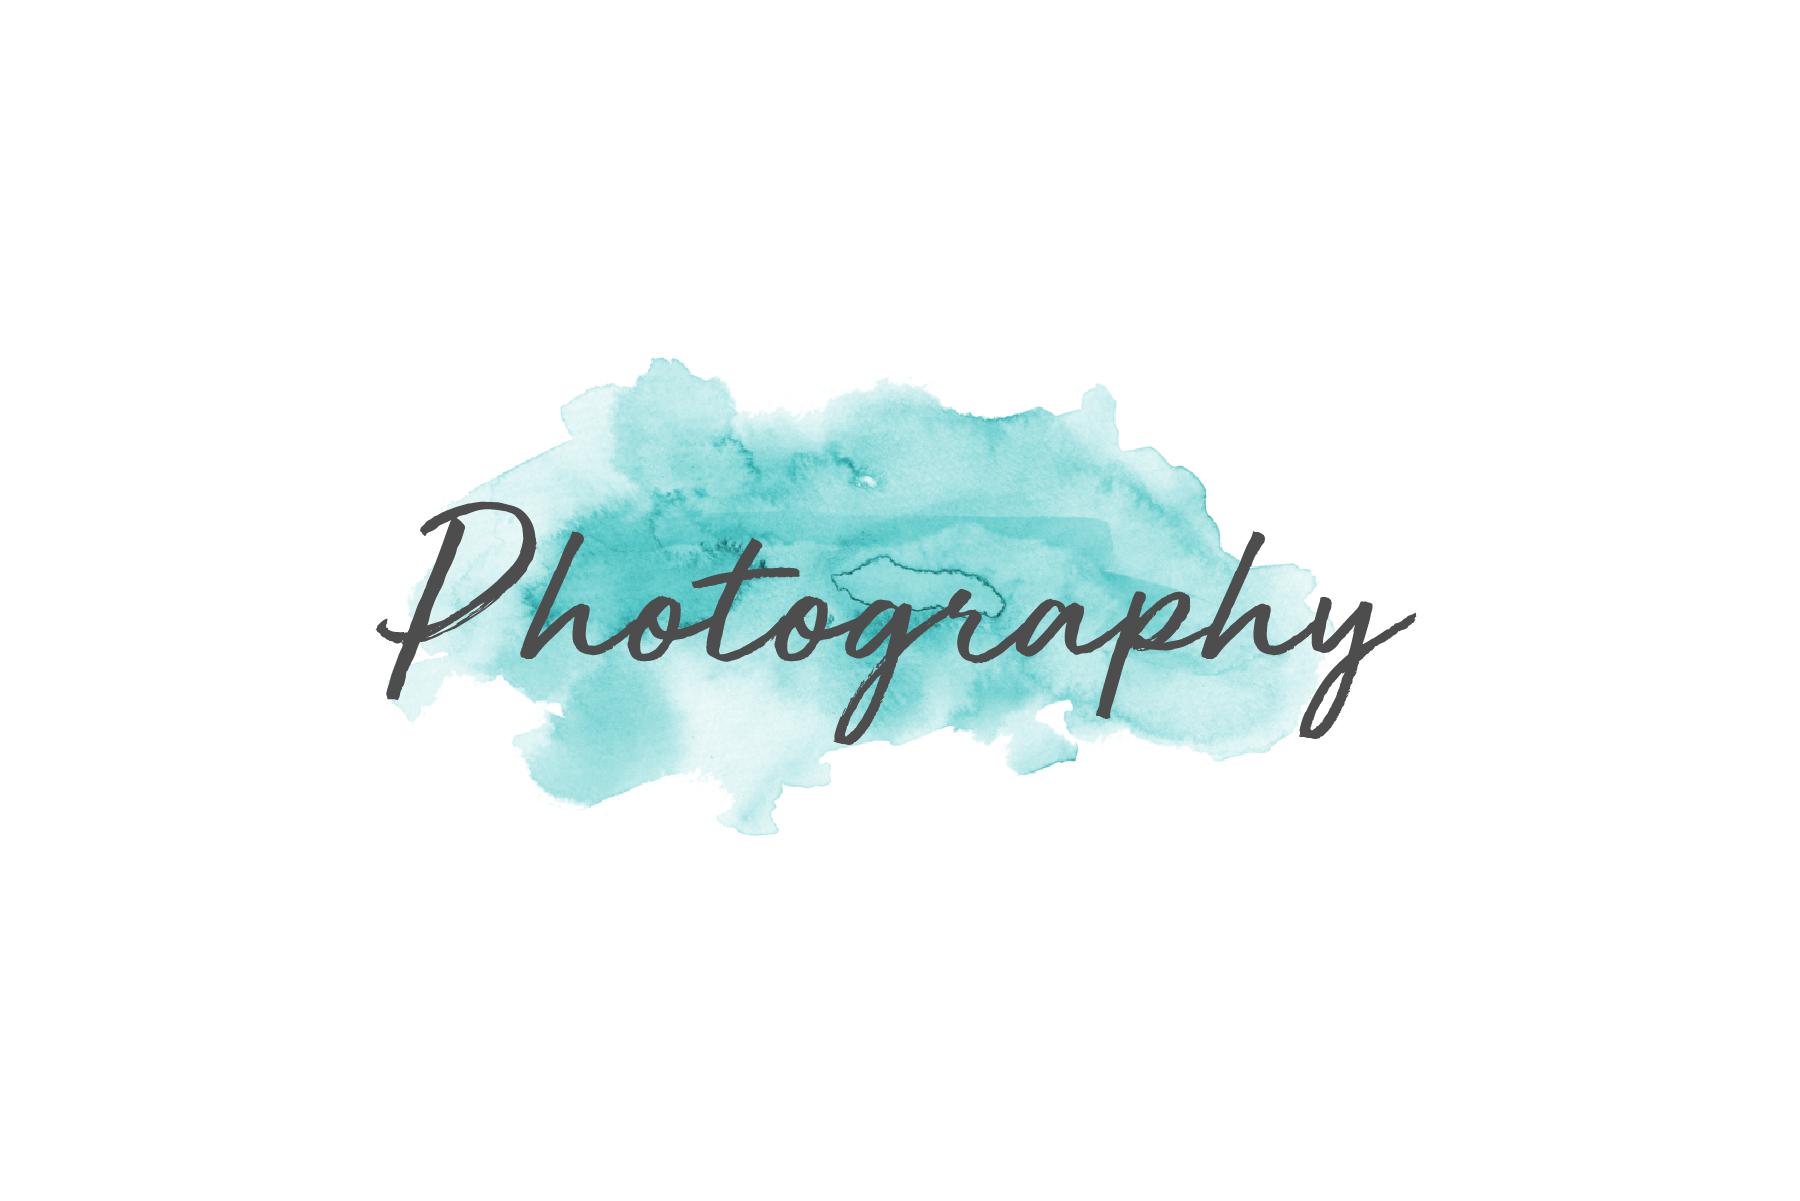 PhotographyIcon.jpg